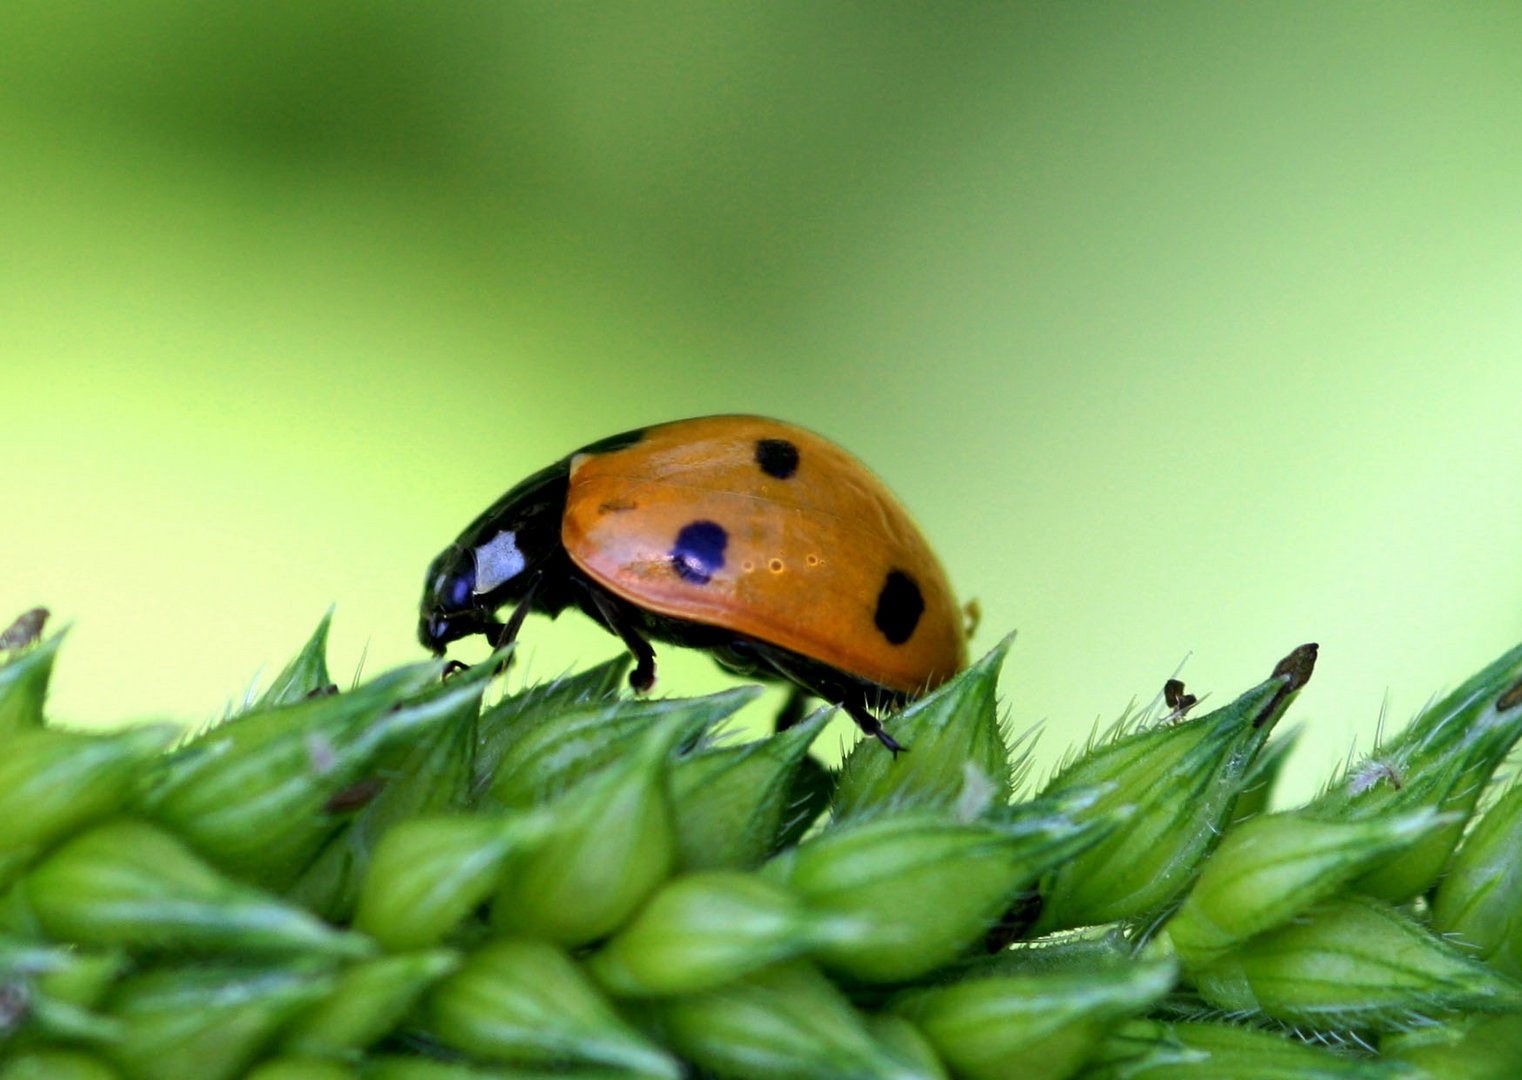 Käfer im Glück